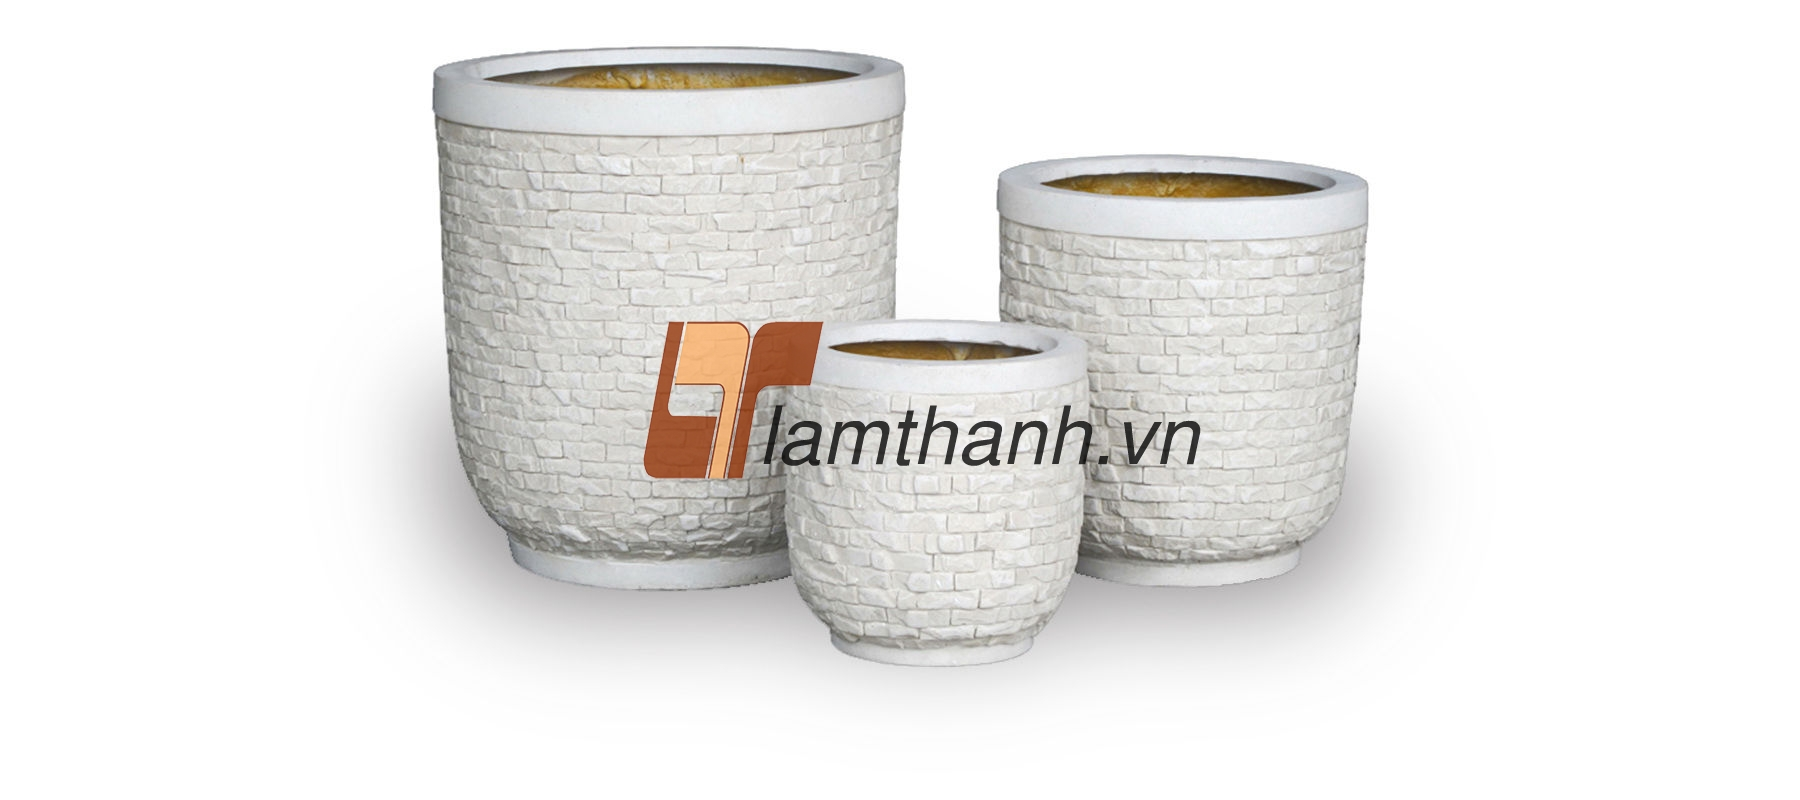 vietnam polystone, polyresin 08